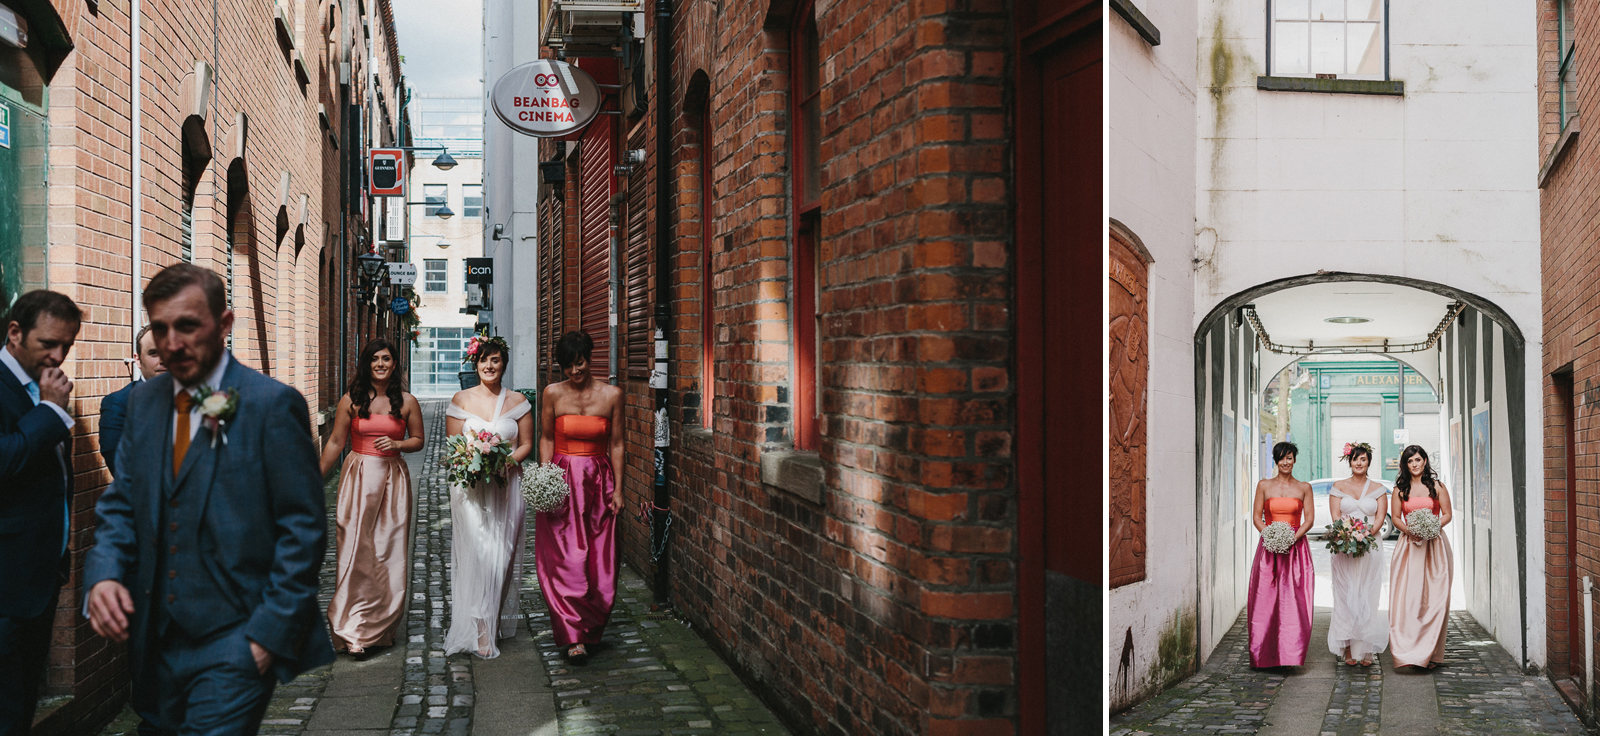 TheCampbells_Merchant_Hotel_Wedding_2.jpg